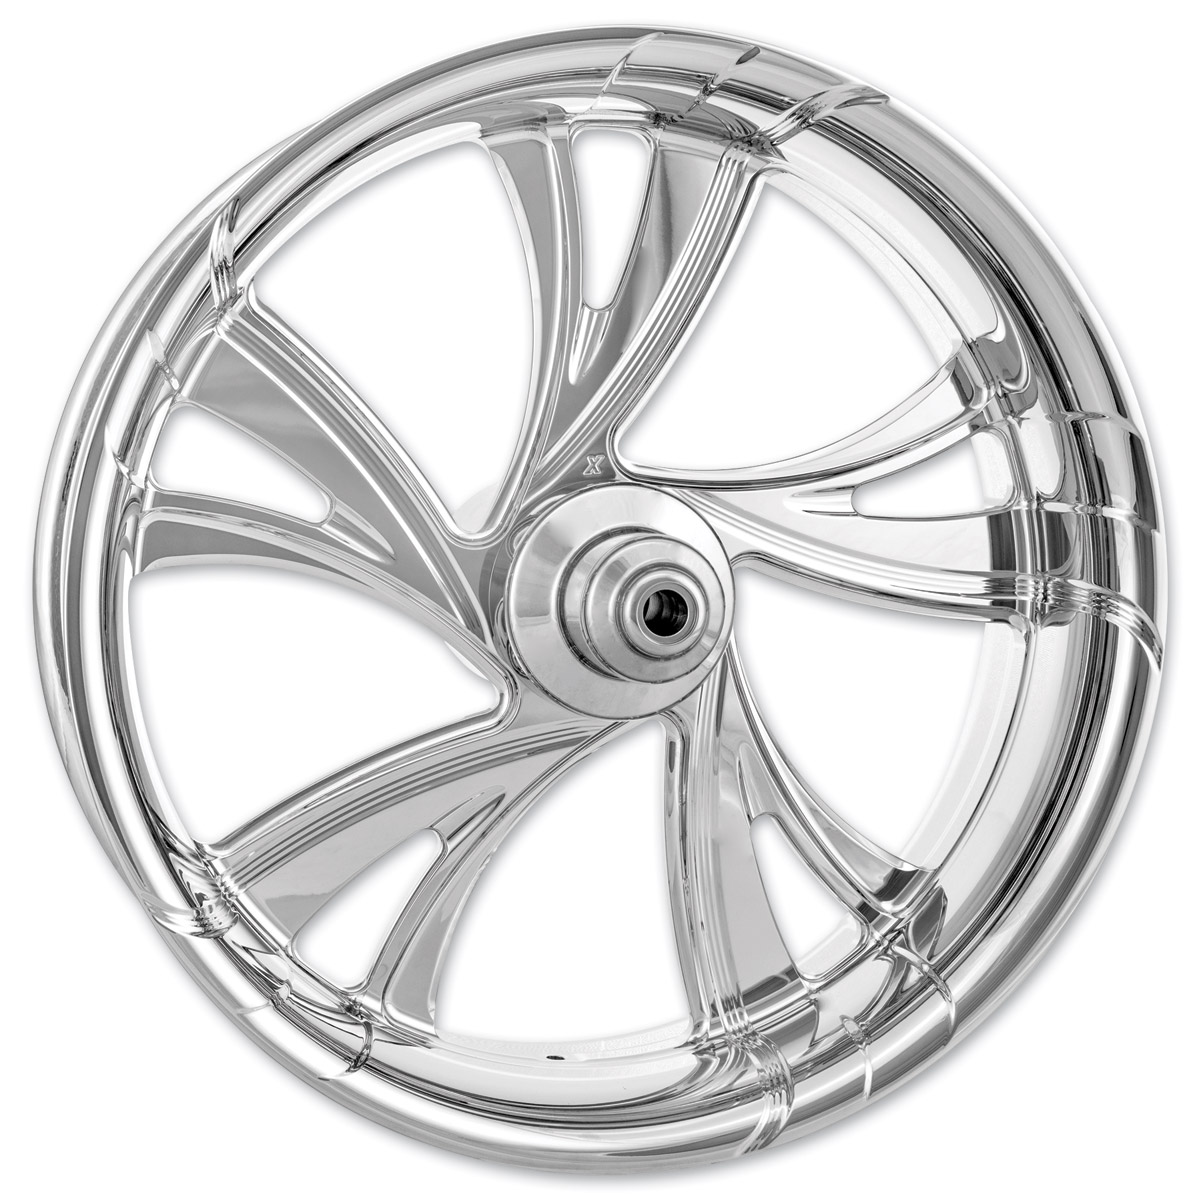 Xtreme Machine Chrome Forged Cruise Front Wheel, 18″ x 3.5″